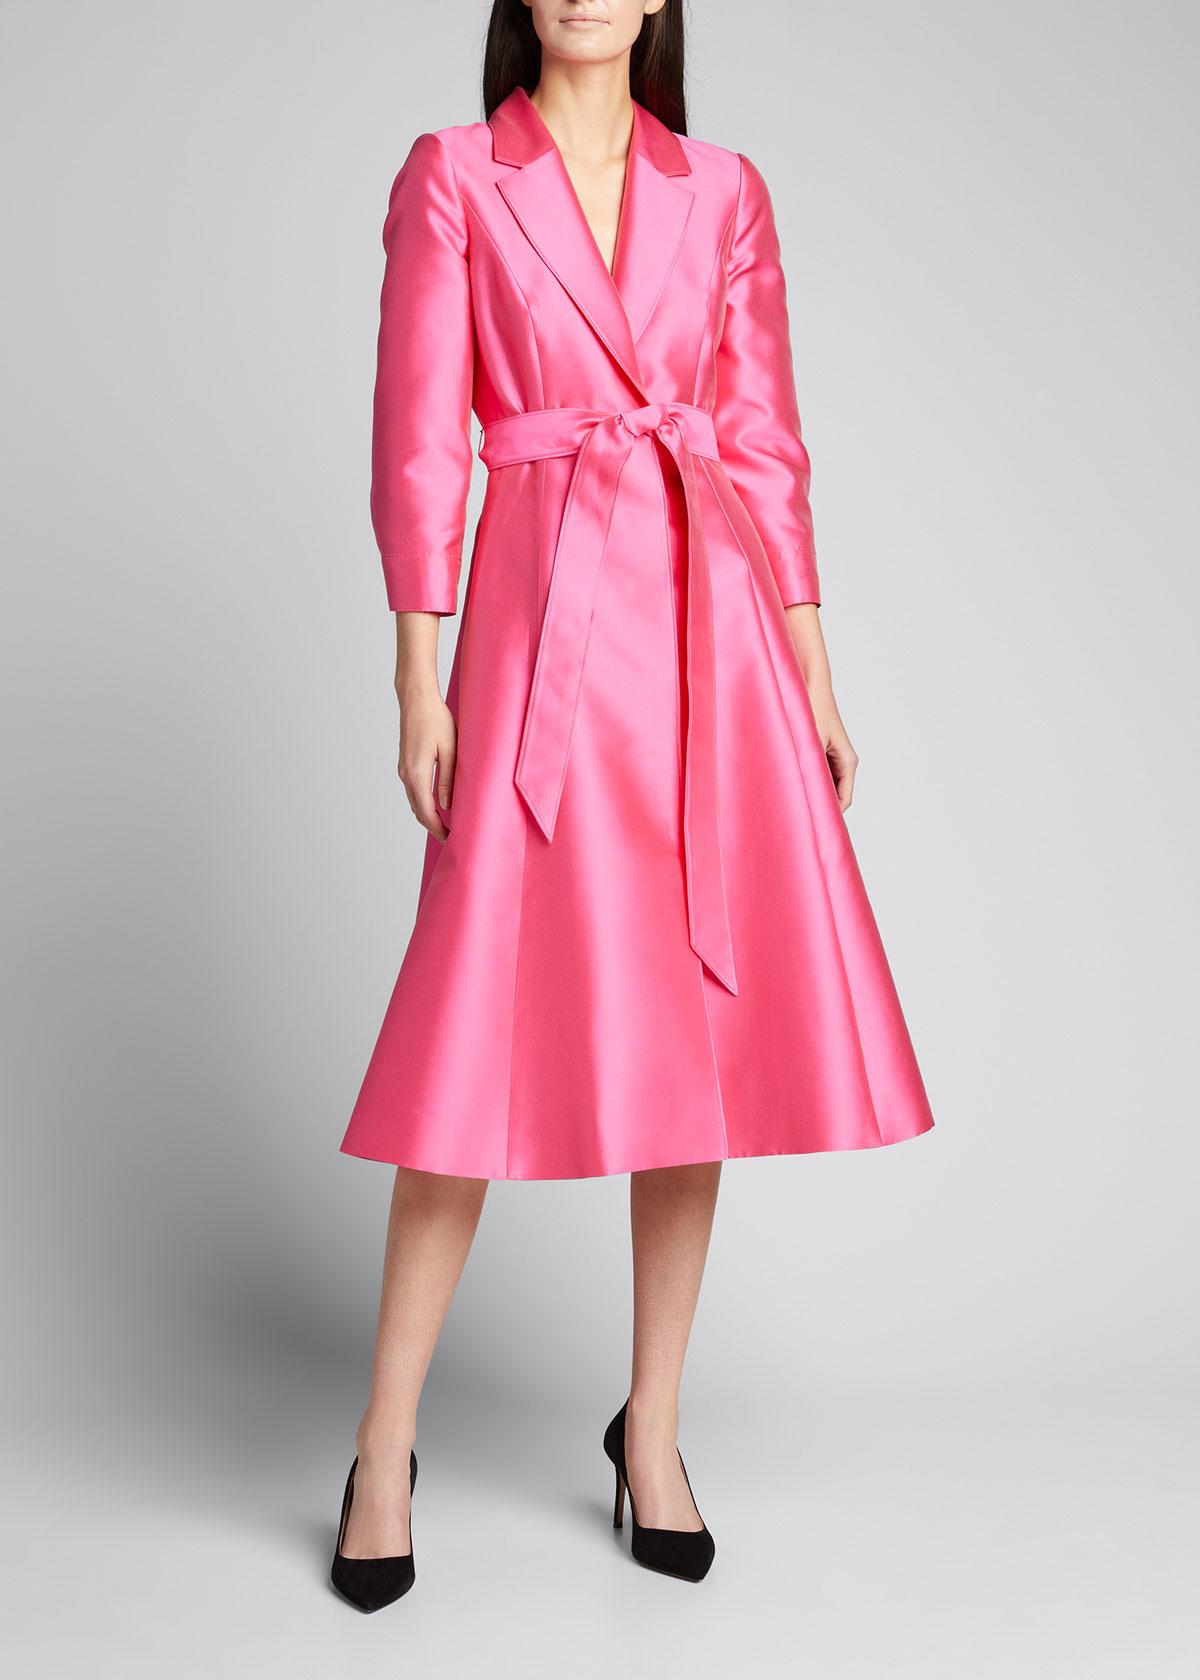 Carolina Herrera Taffeta Trench-style Cocktail Dress In Pink